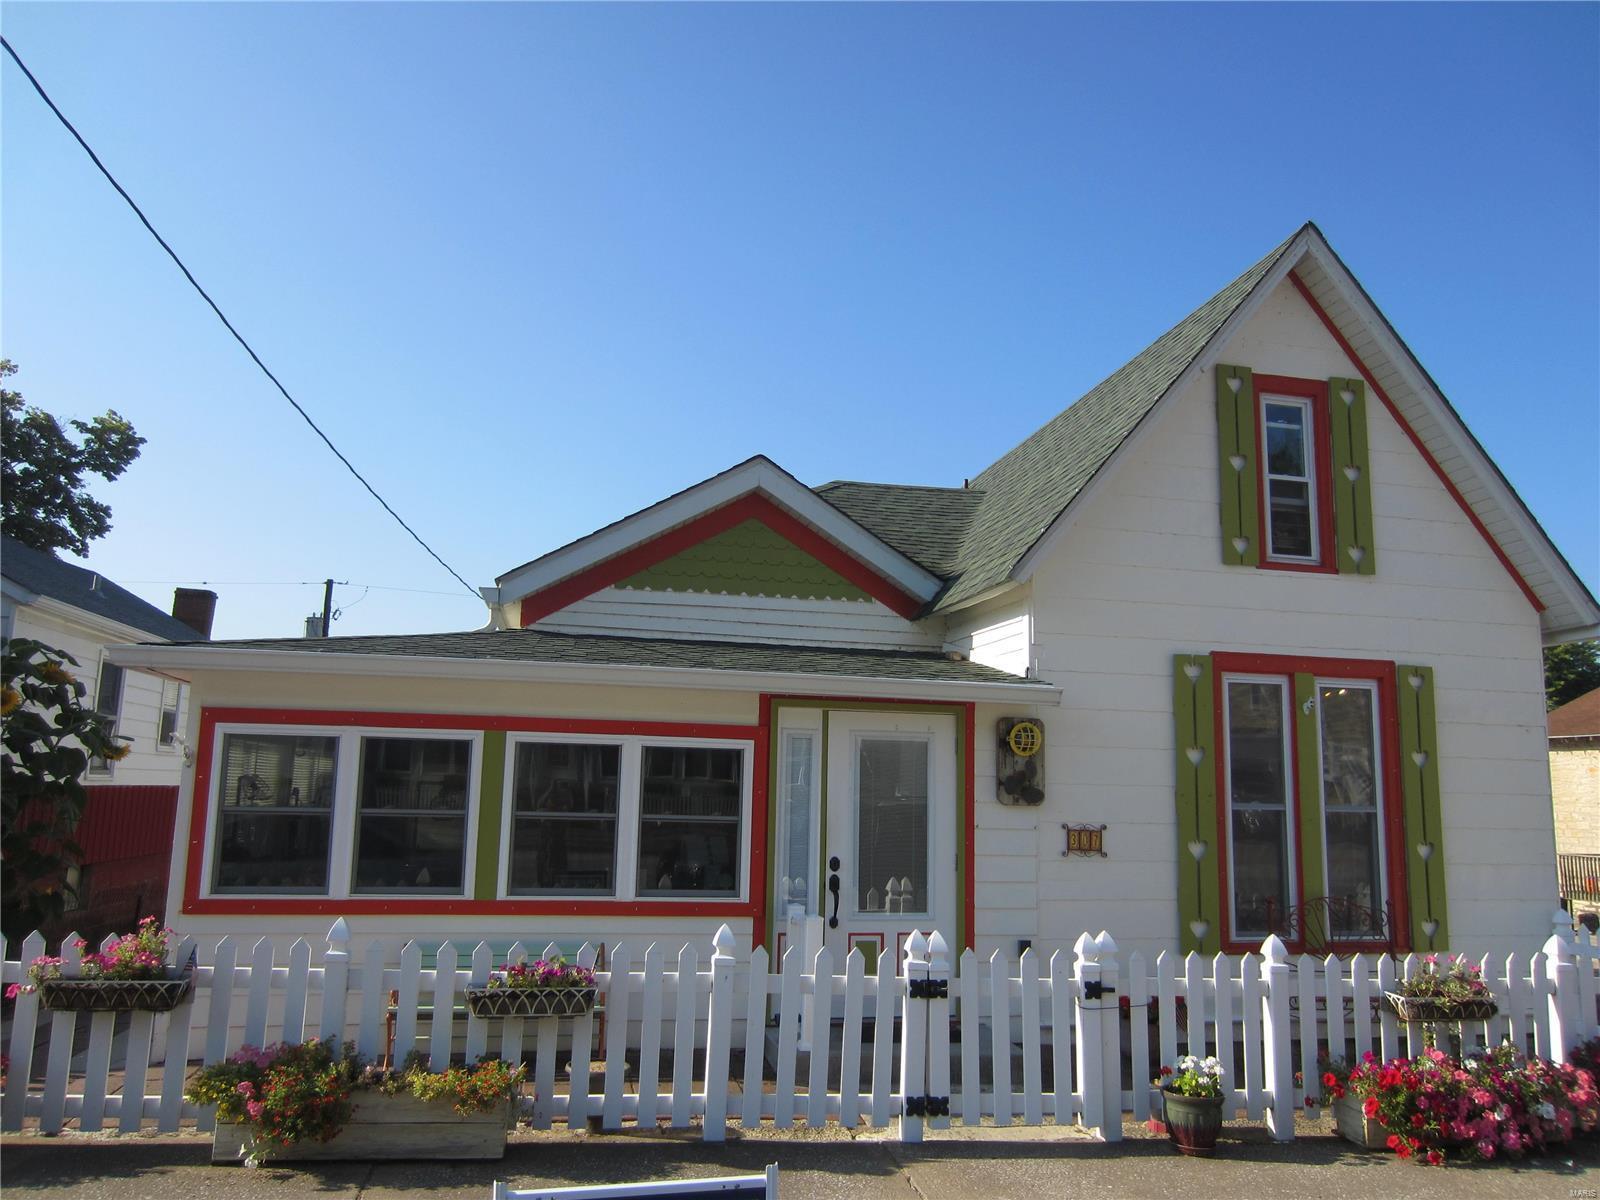 307 E Main Property Photo - Grafton, IL real estate listing